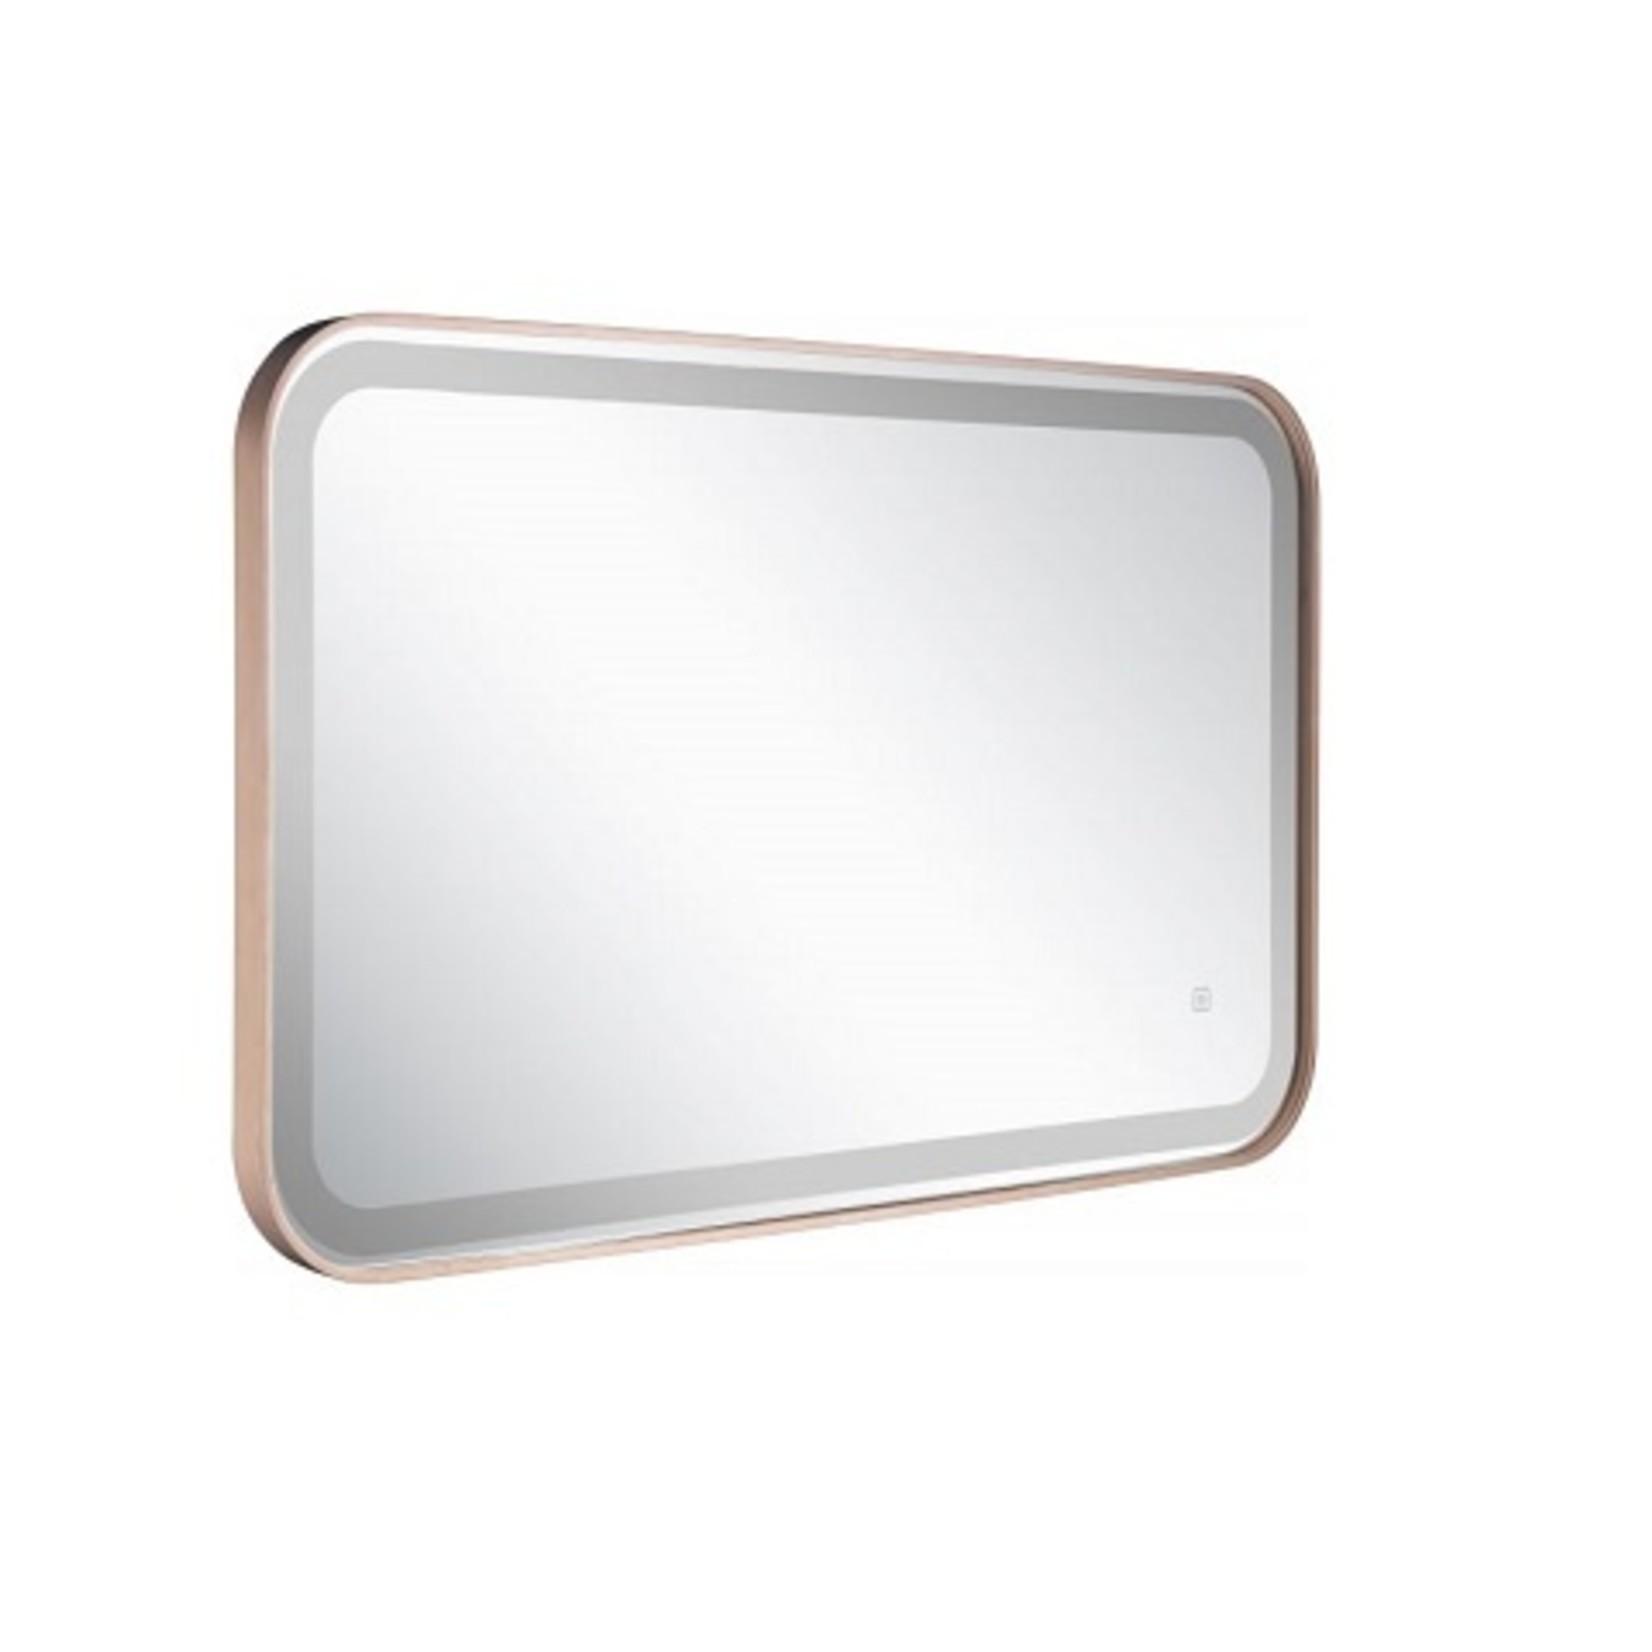 Rectangular LED Mirror with Rounded Black Edges AMH11B02-48